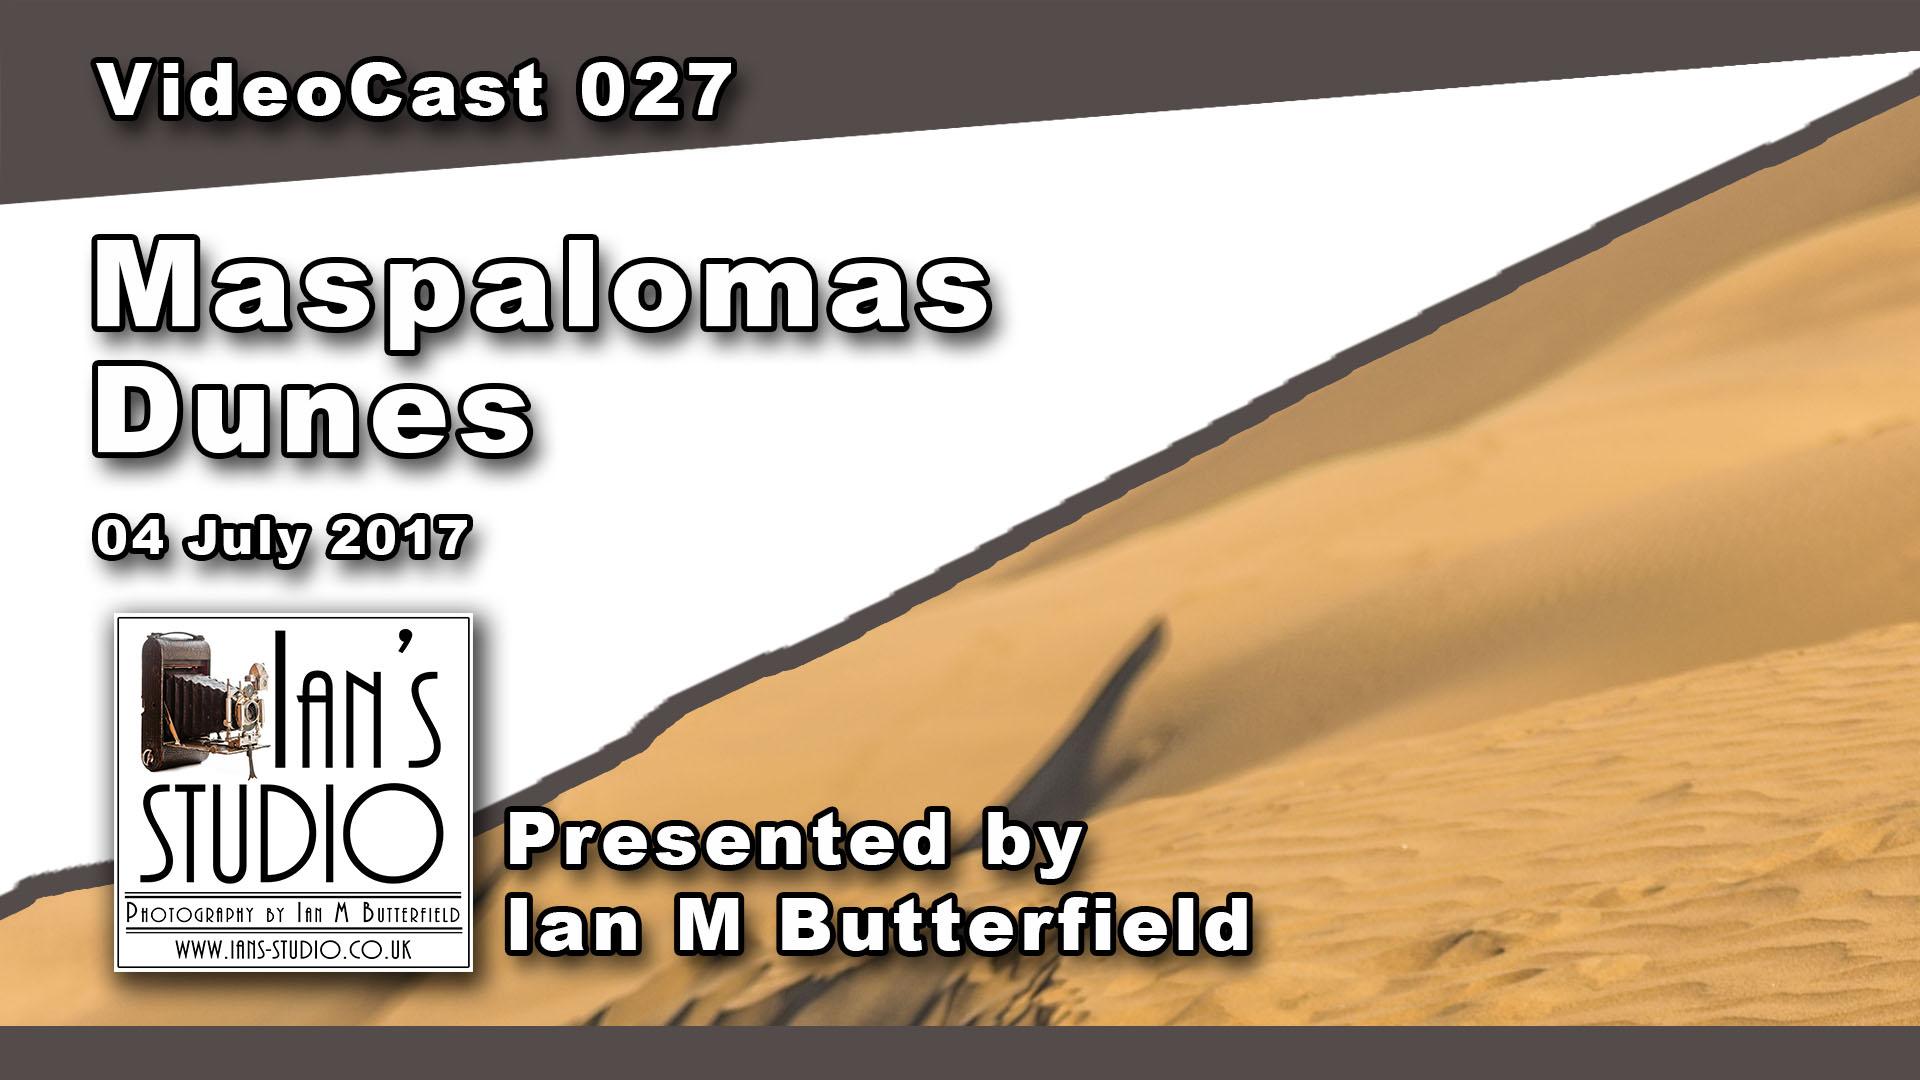 VIDEOCAST 027: Maspalomas Dunes